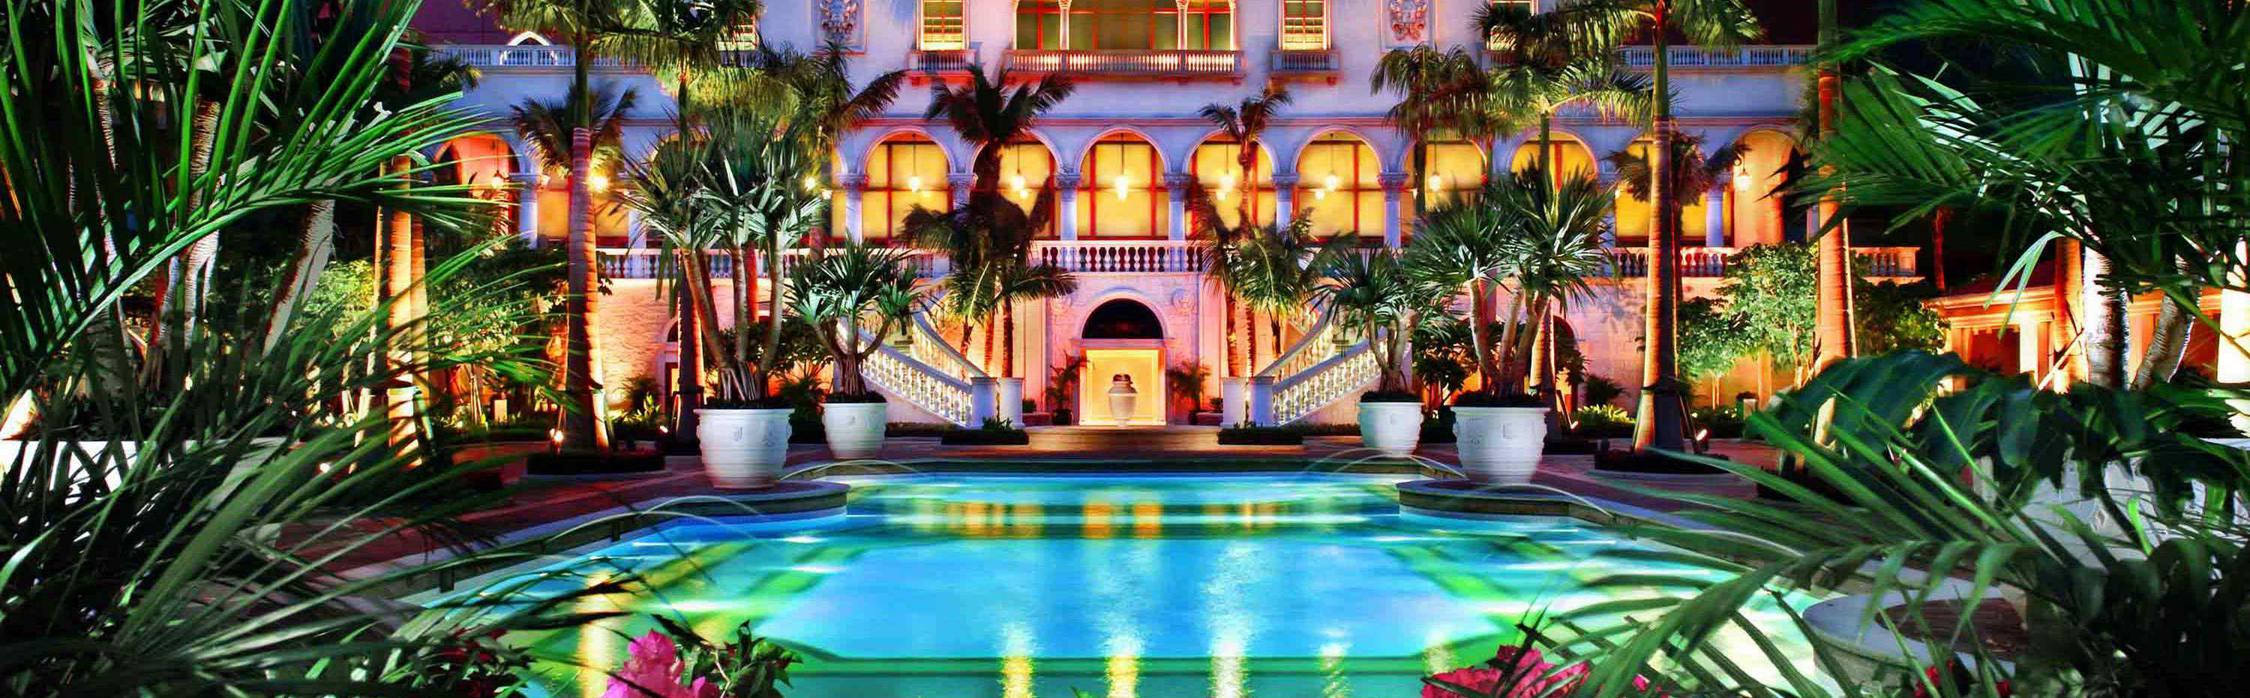 Venetian Pool | Macau Hotel Swimming Pool | The Venetian Macao ...